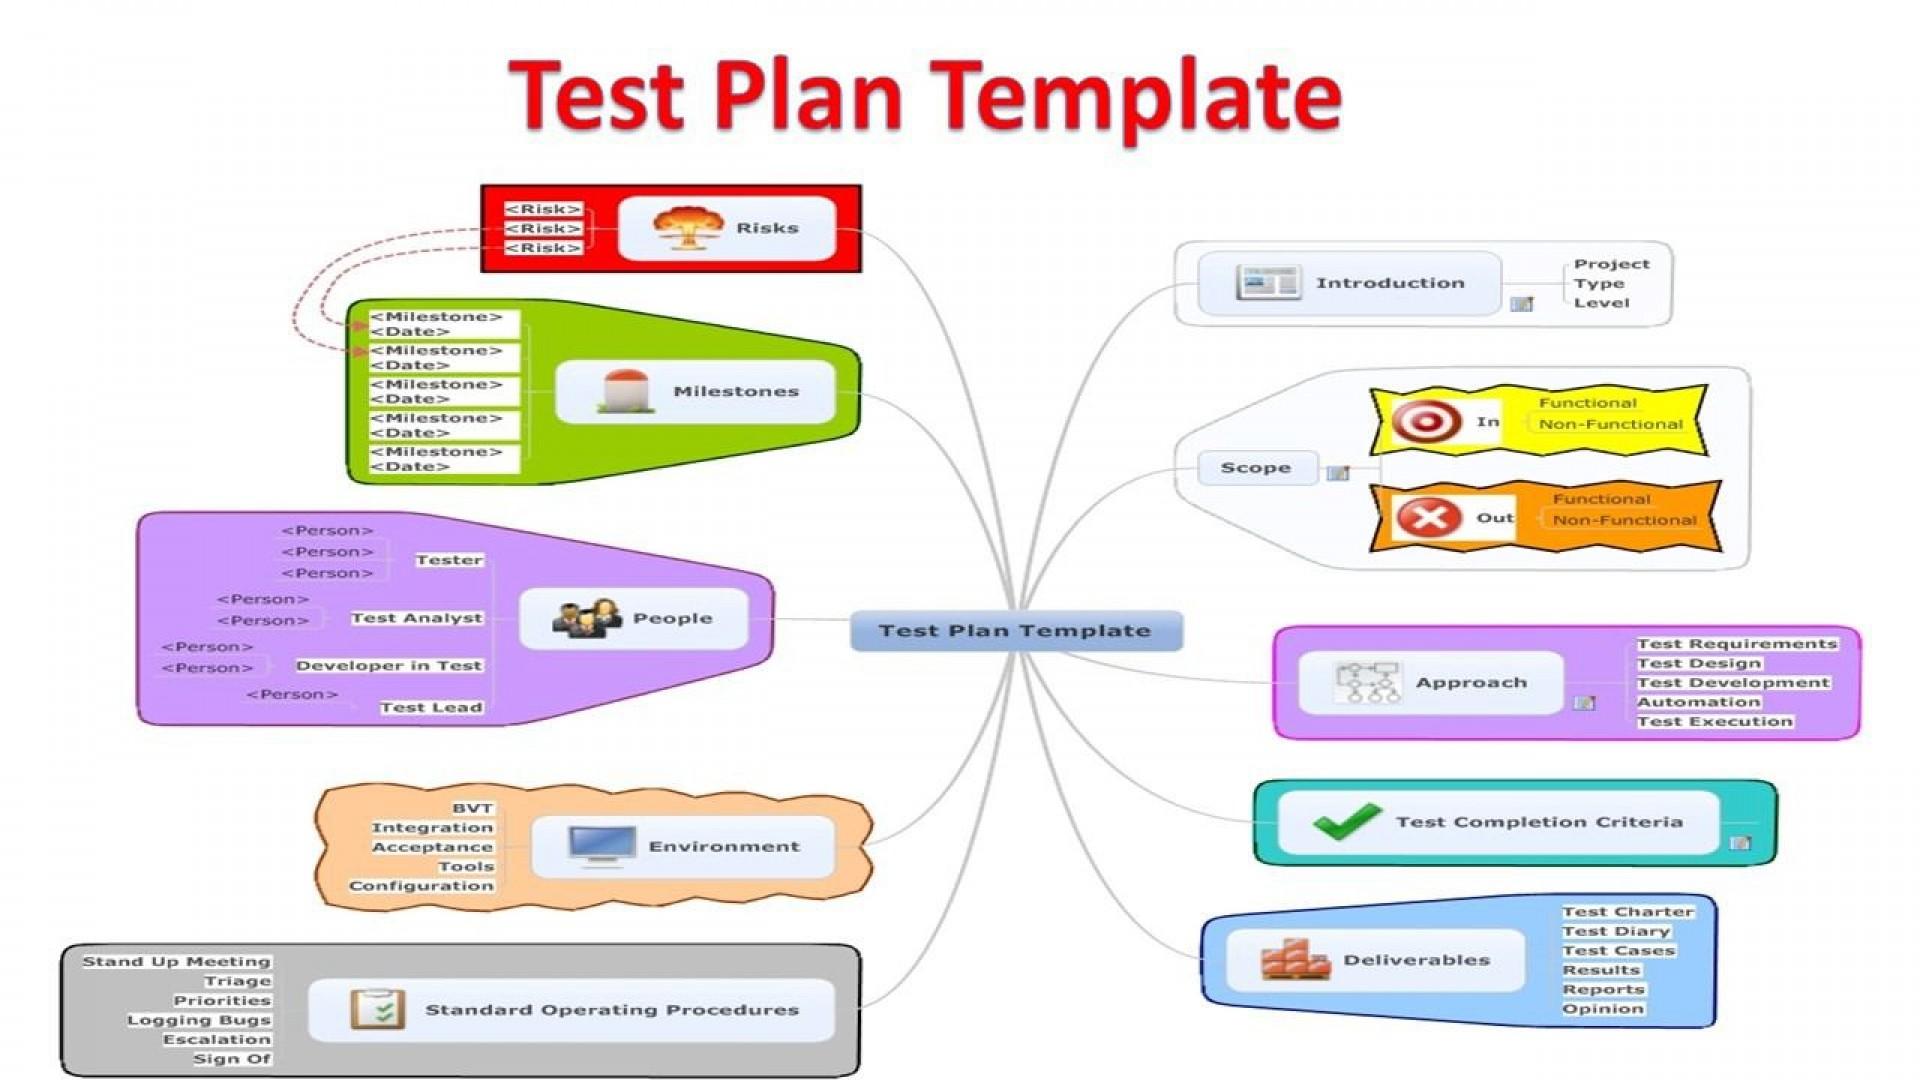 004 Wondrou Software Testing Plan Template Inspiration  Test Agile Unit Example Pdf1920